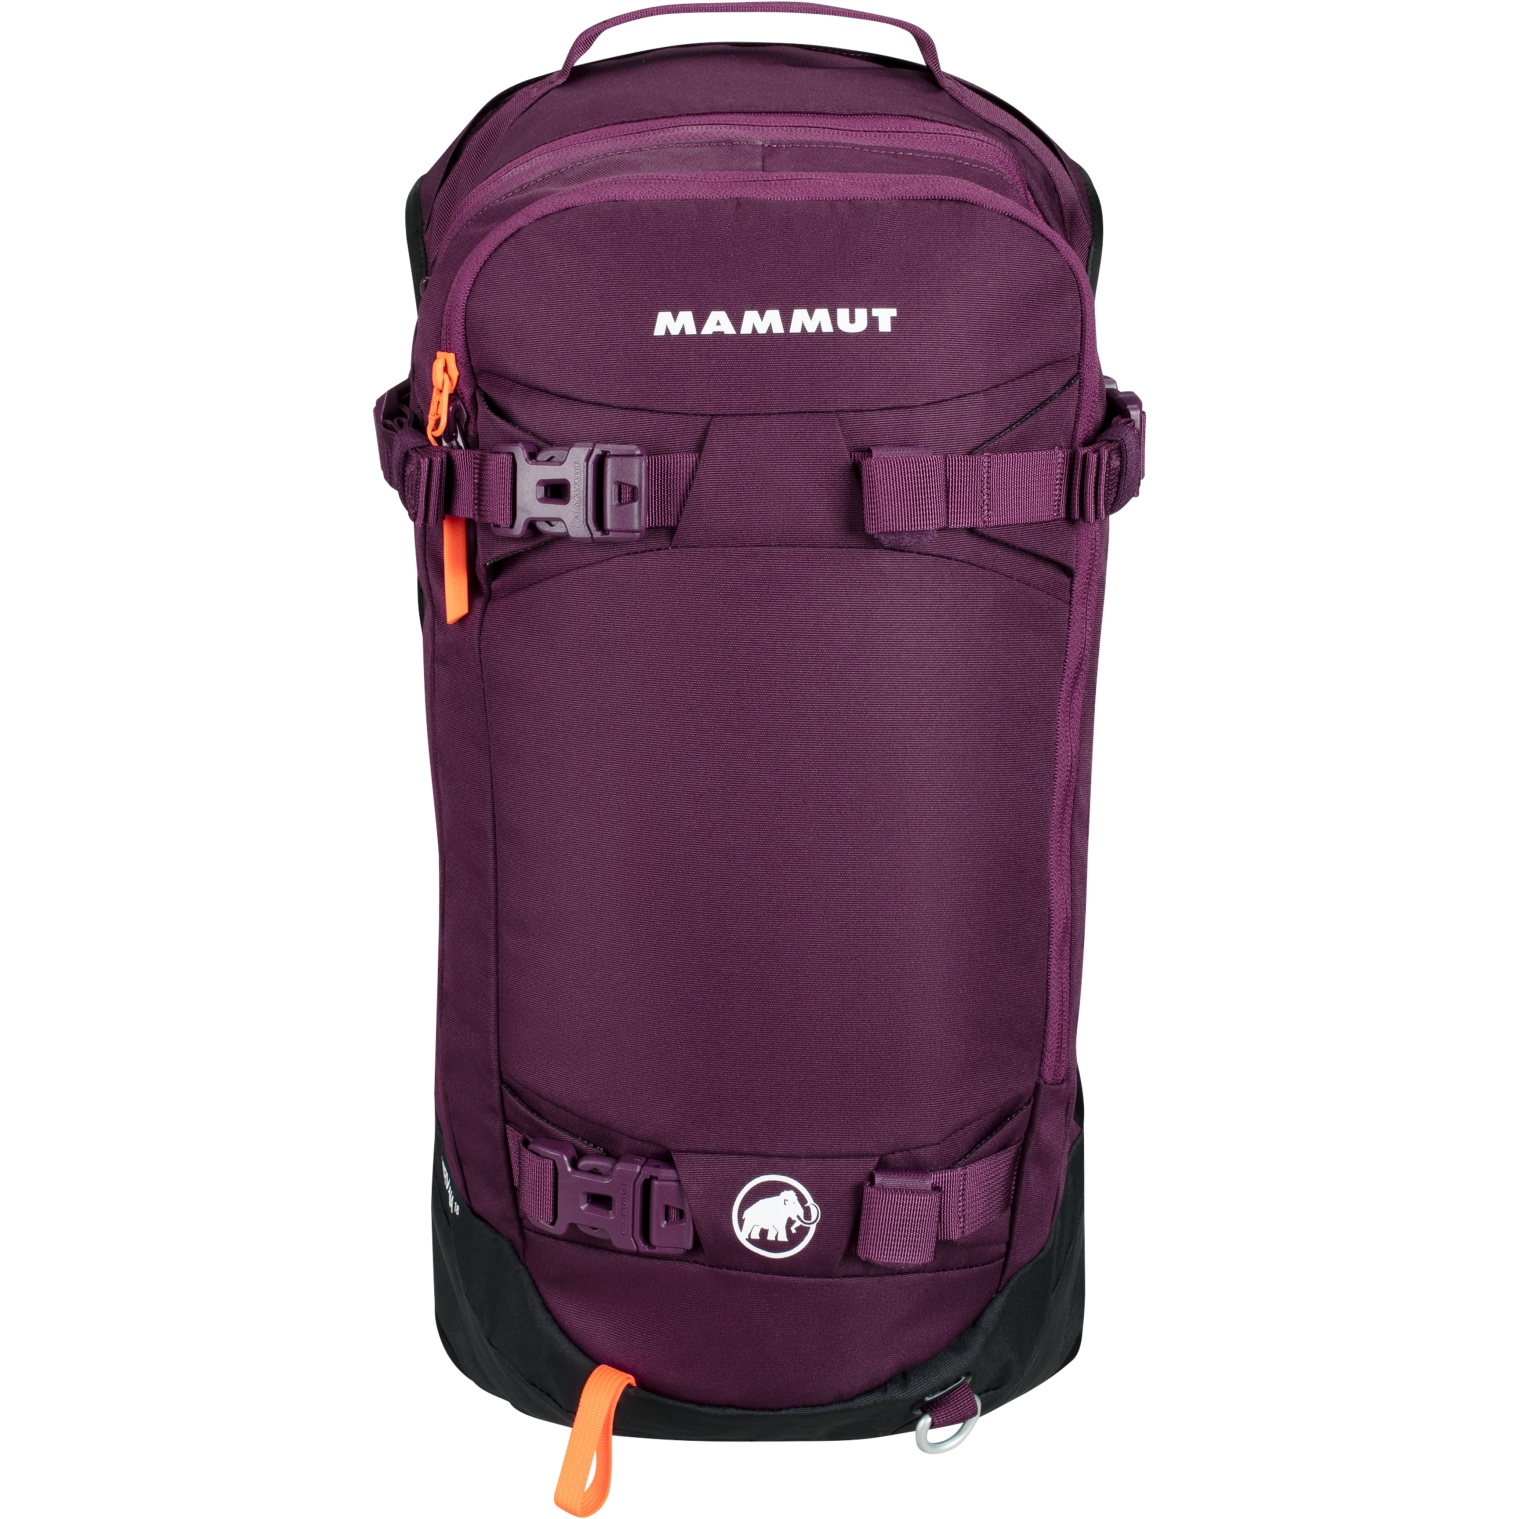 Mammut Nirvana 18 Backpack - grape-black